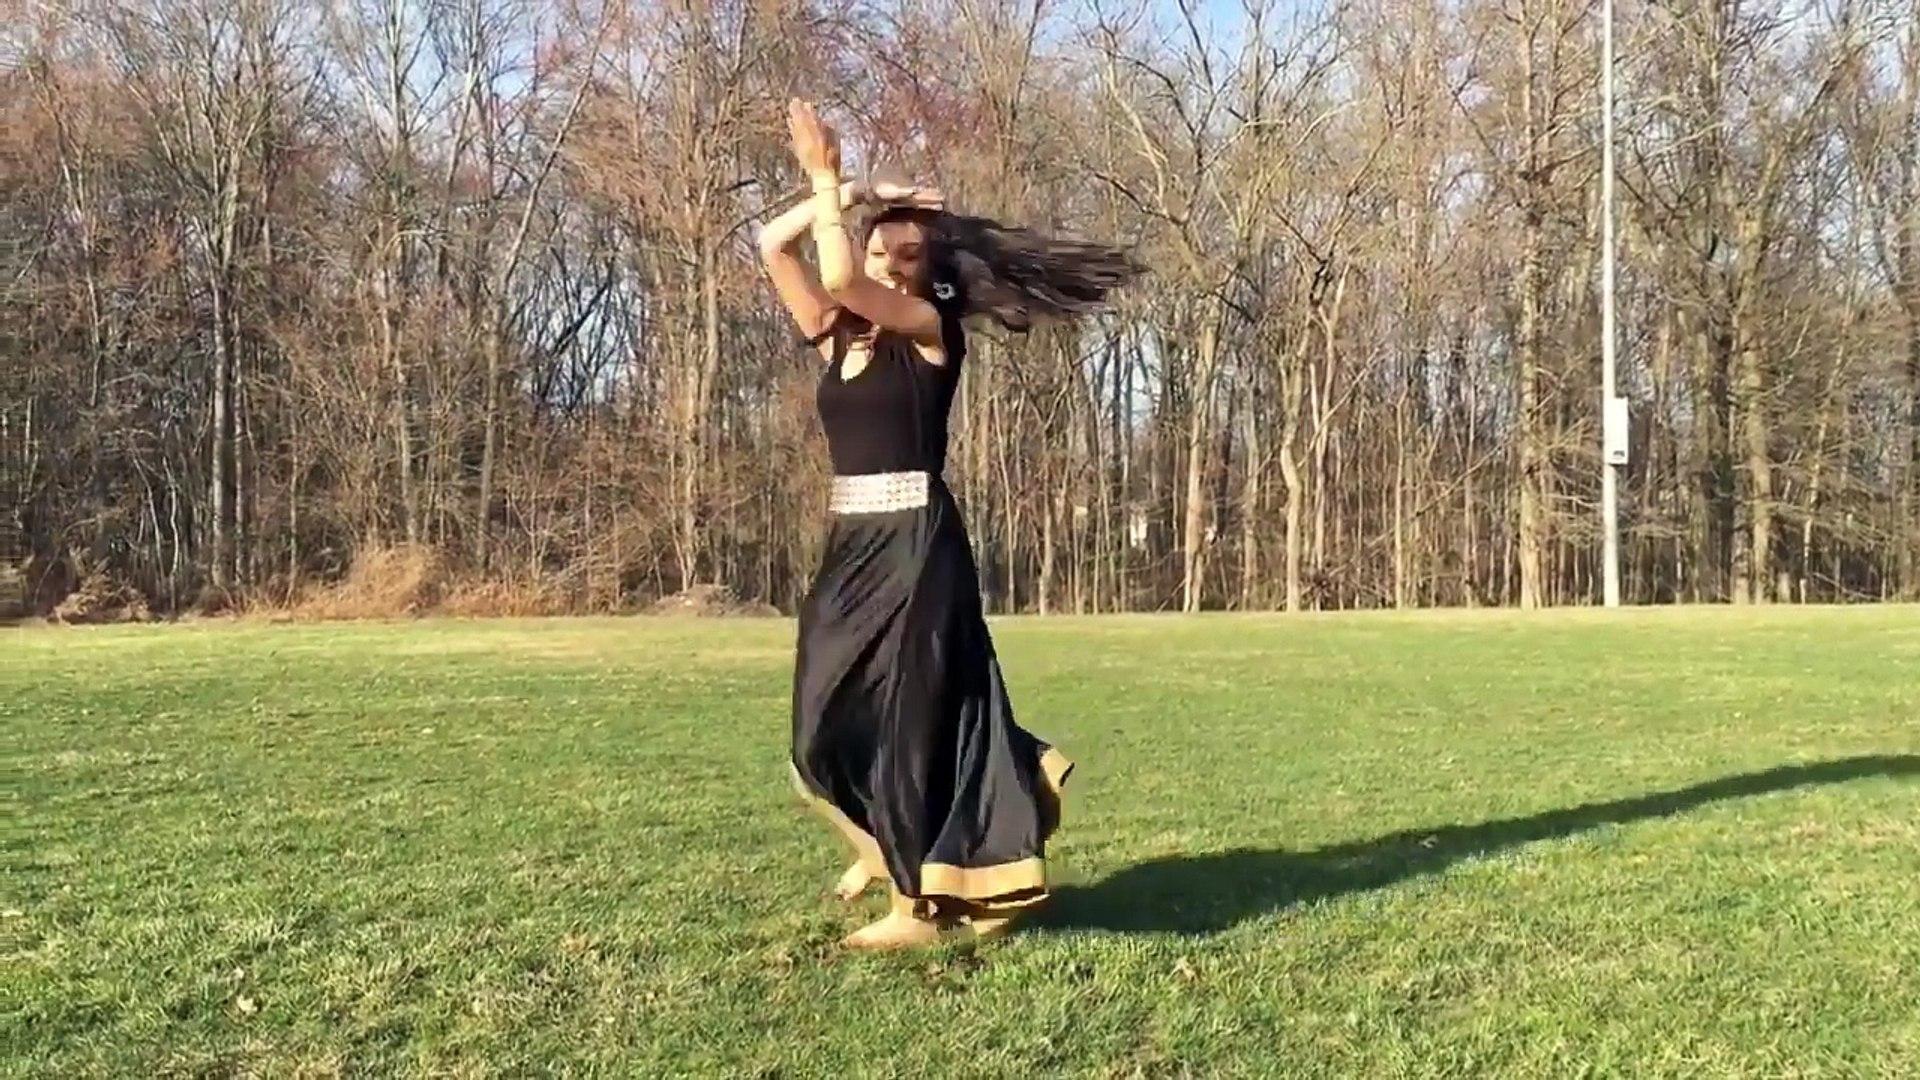 Laung_laachi_dance_performance